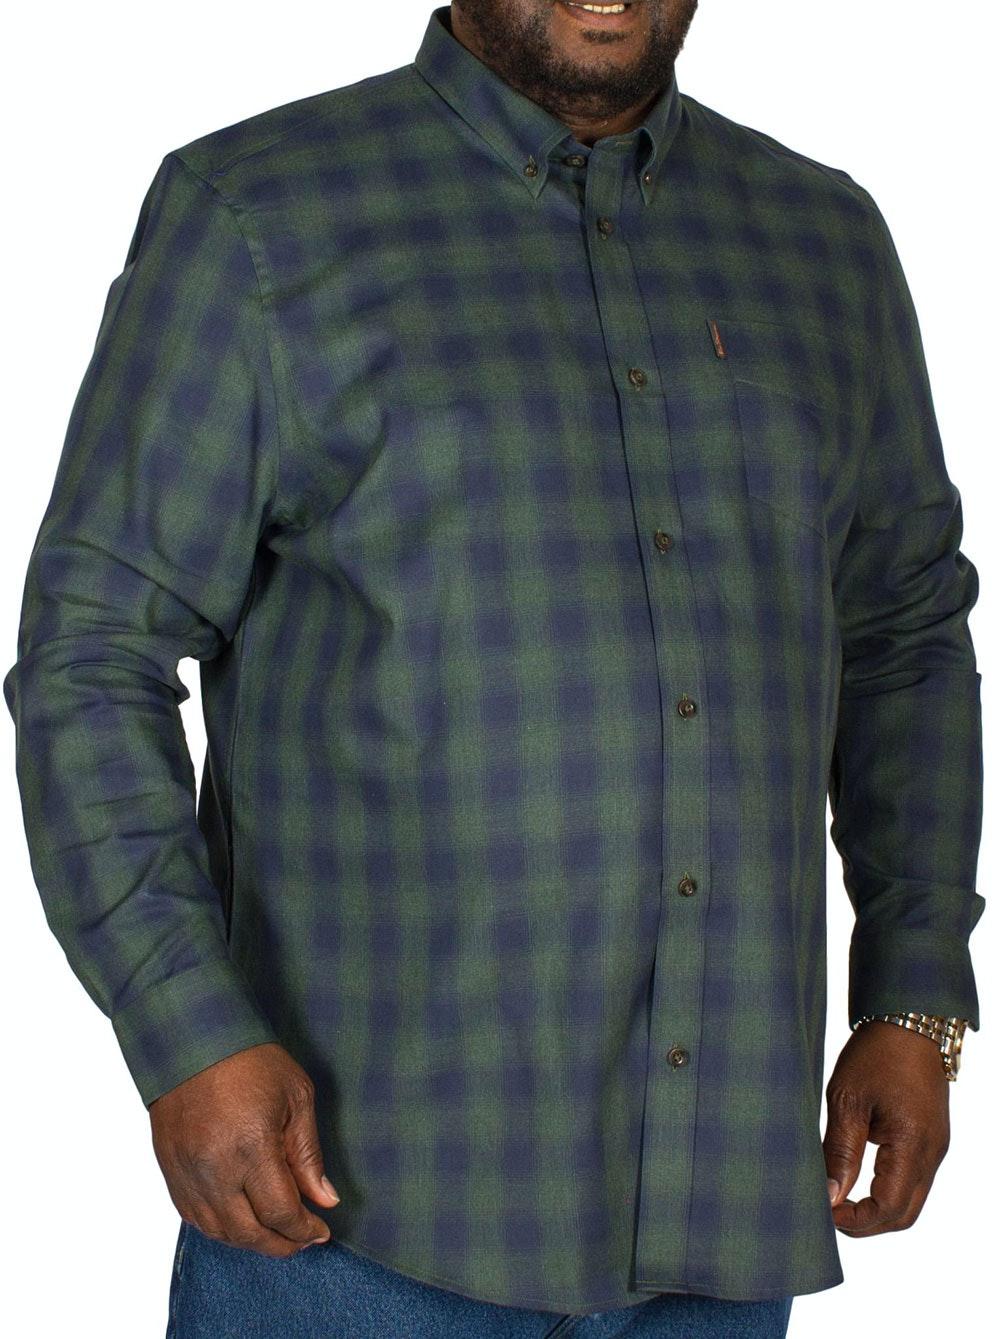 Ben Sherman Ombre Check Shirt Green